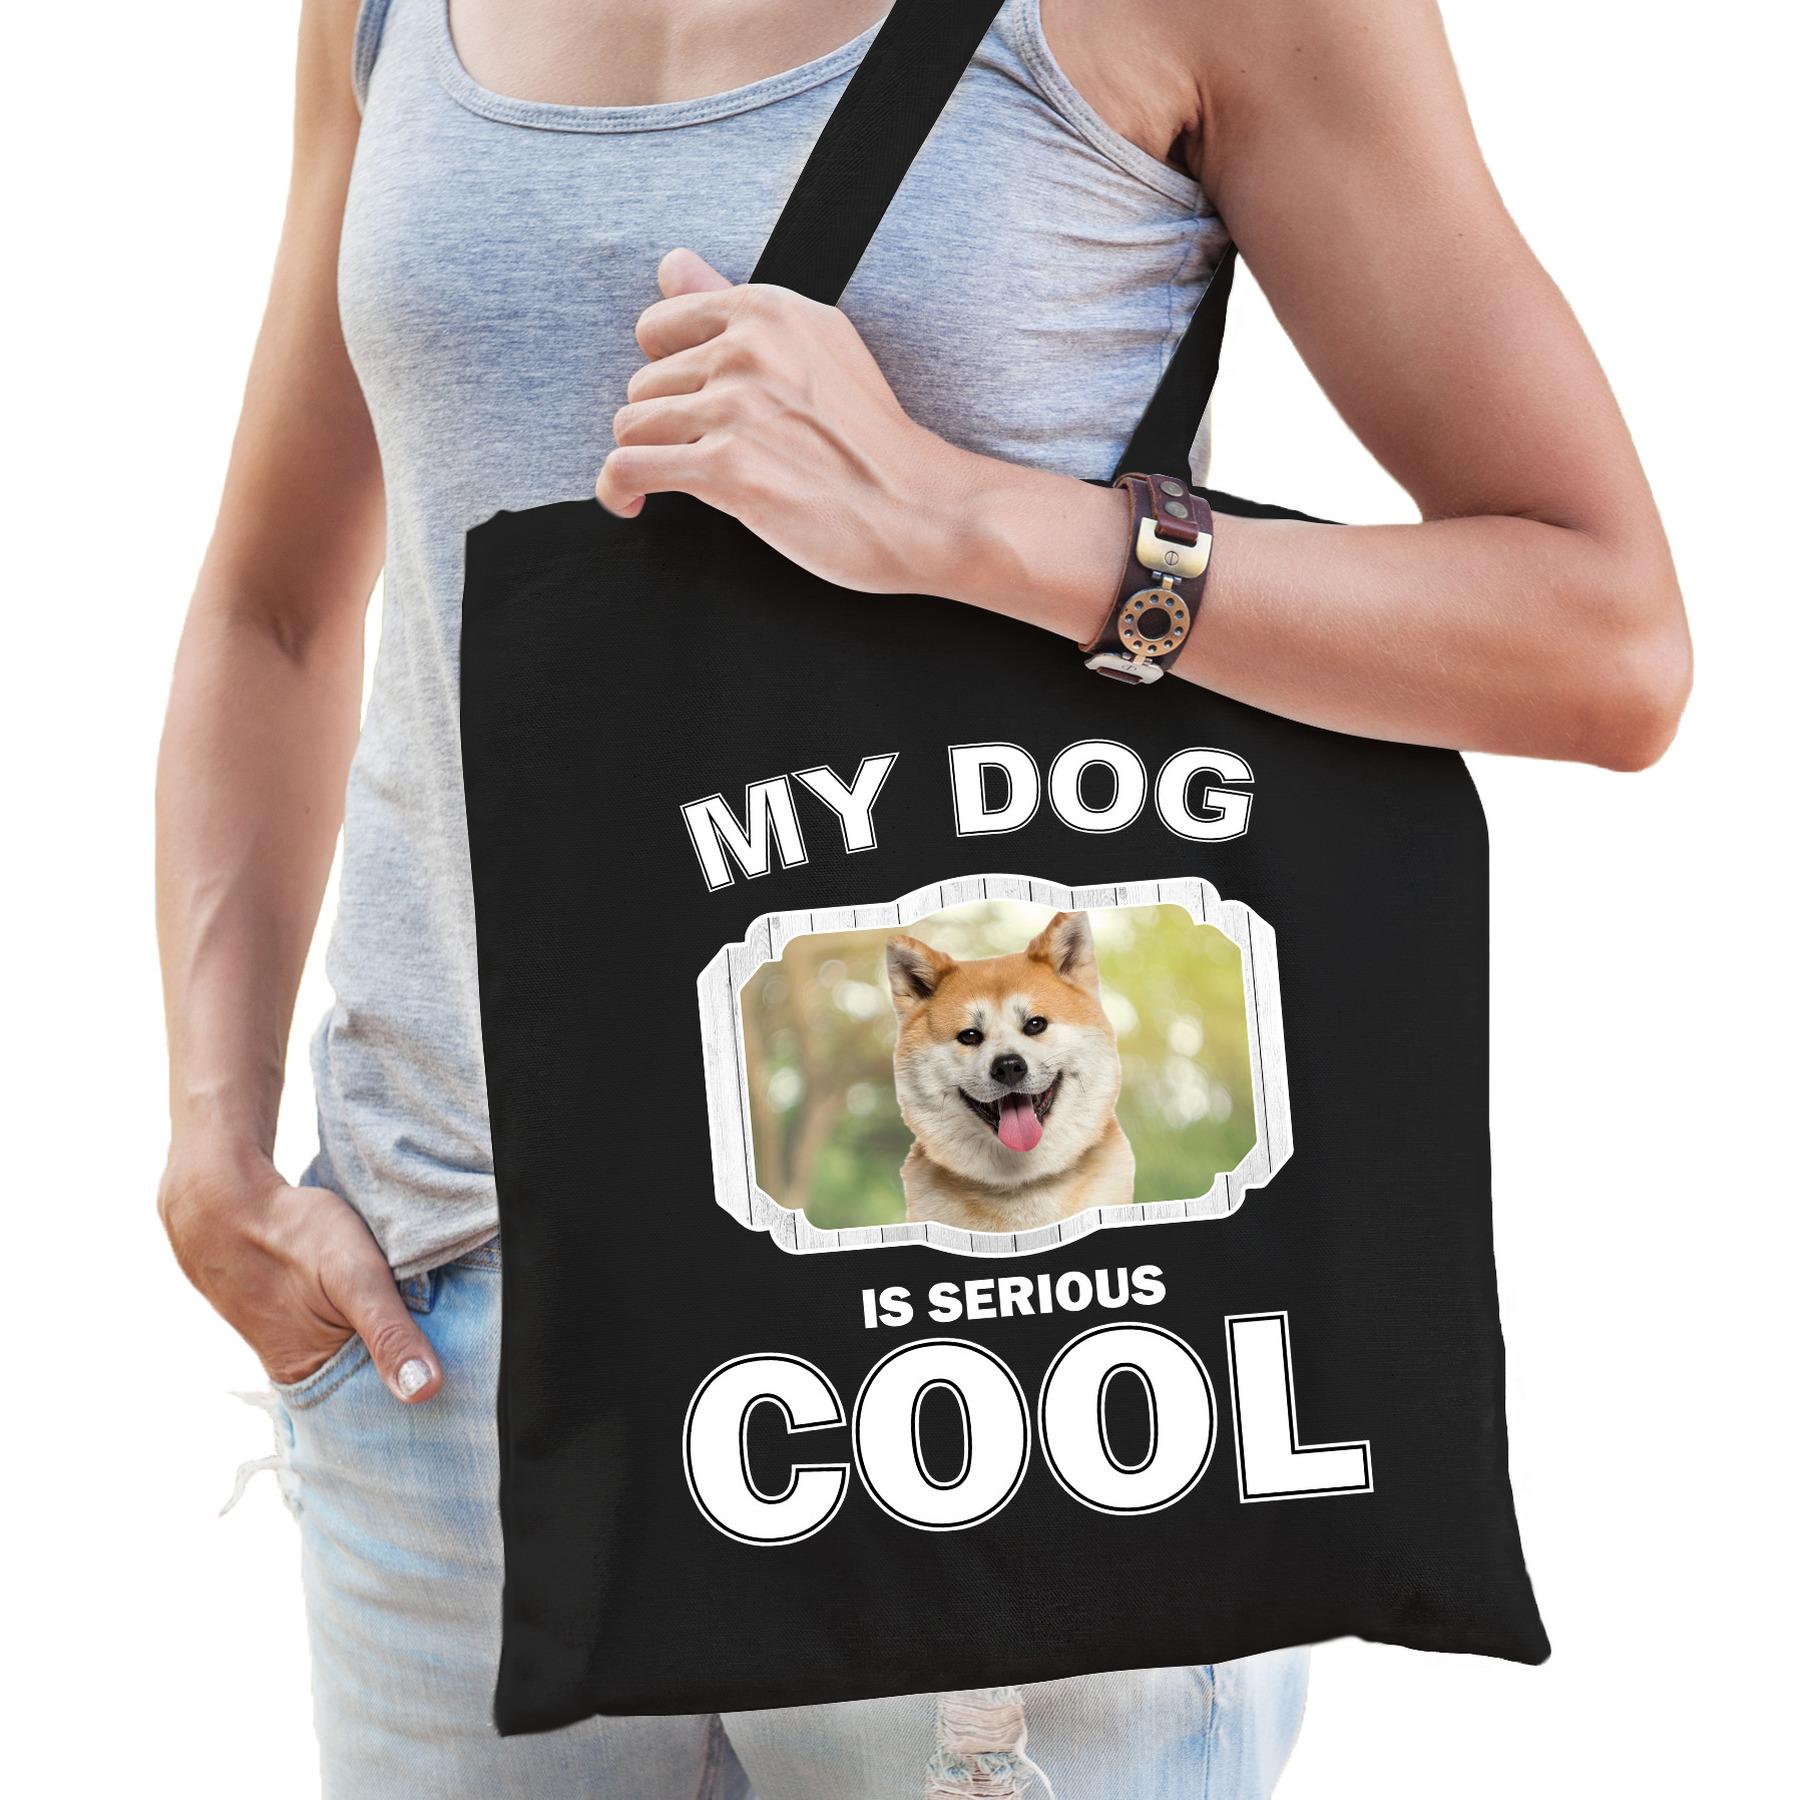 Katoenen tasje my dog is serious cool zwart - Akita inu honden cadeau tas